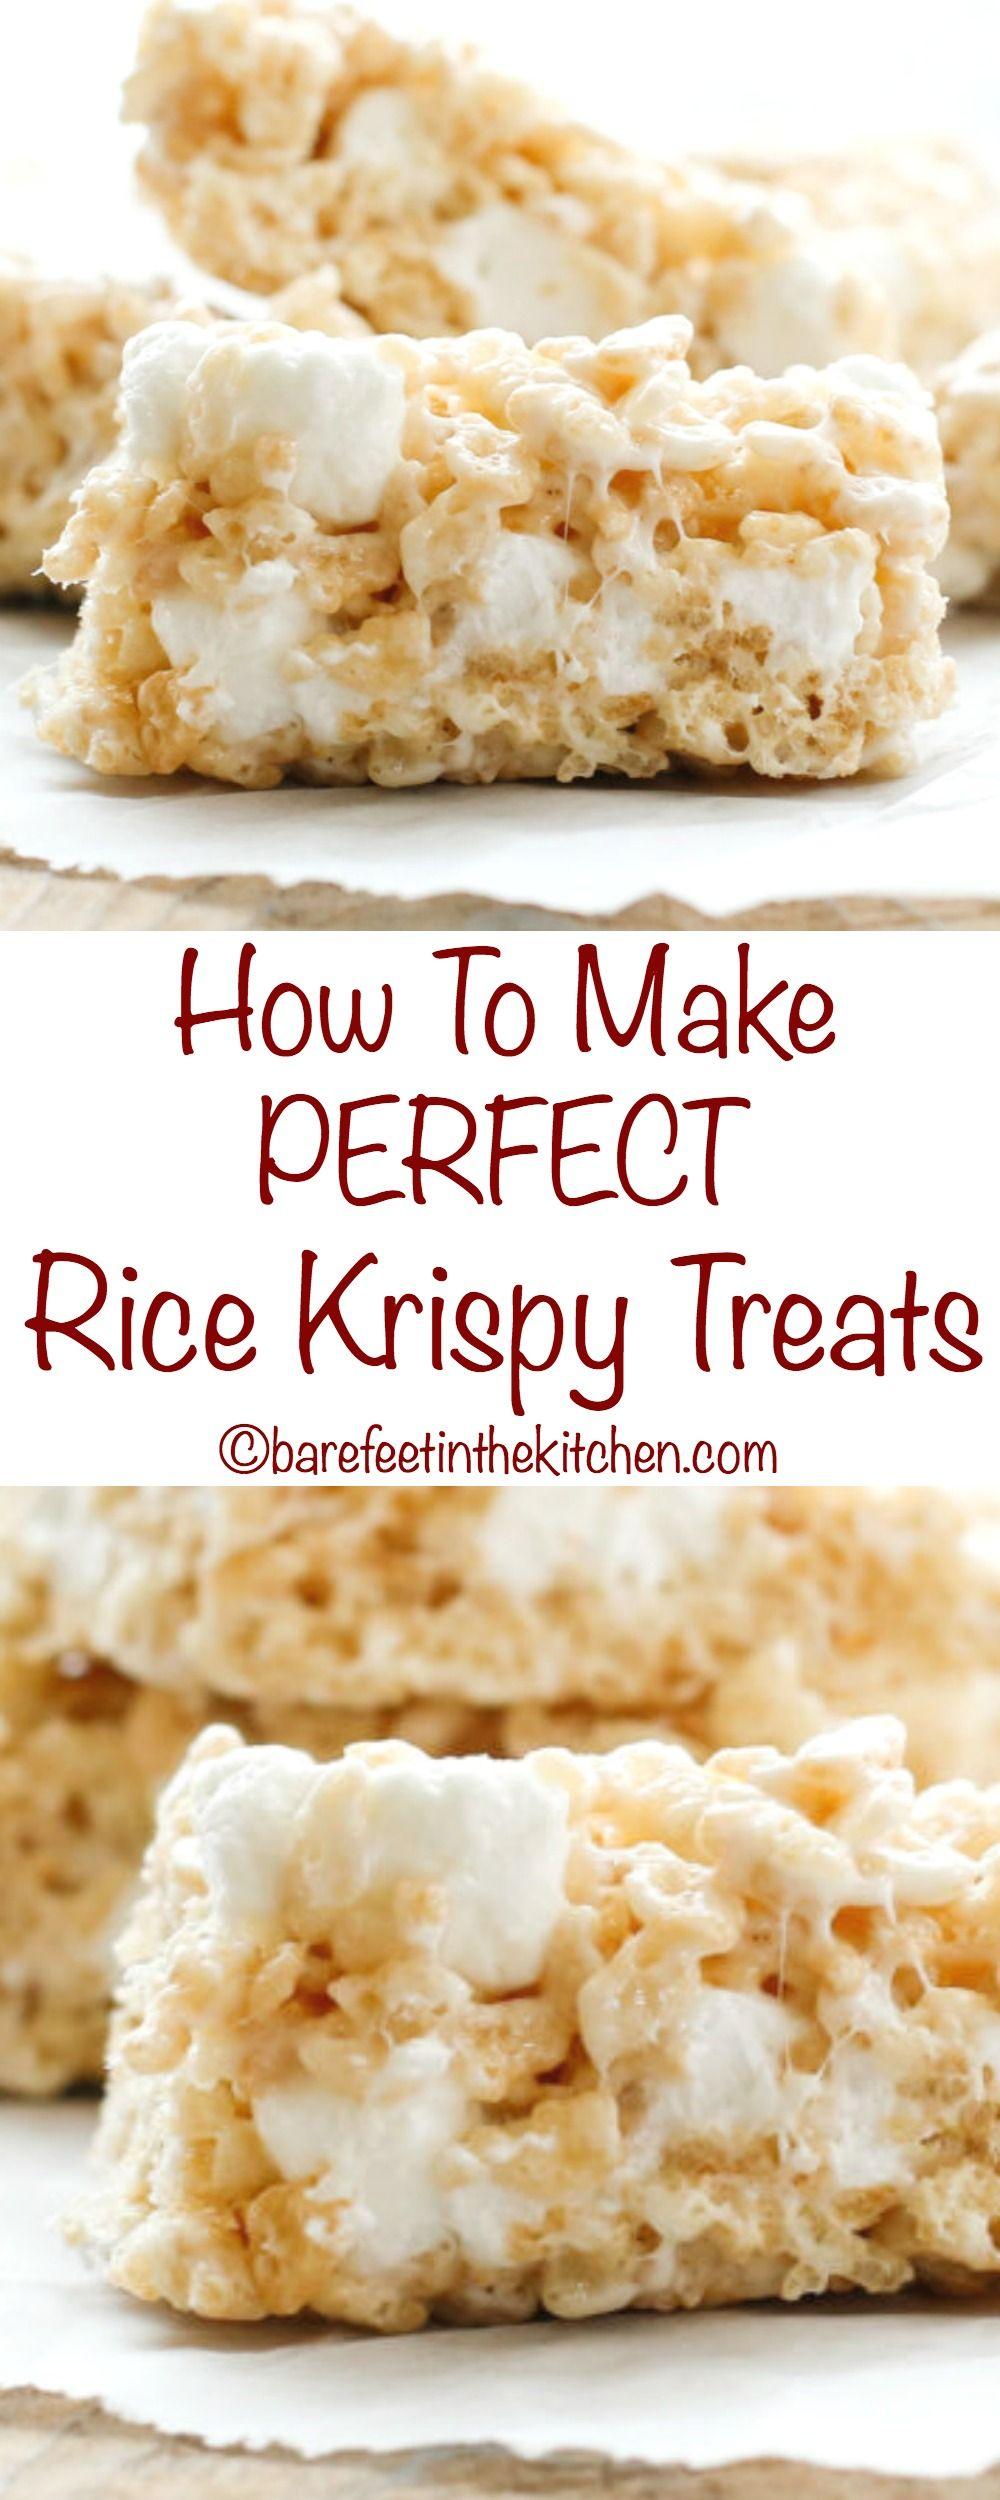 Home handmade candies chocolate dipped rice krispy treats 2 - How To Make Perfect Rice Krispy Treats Get The Recipe At Barefeetinthekitchen Com